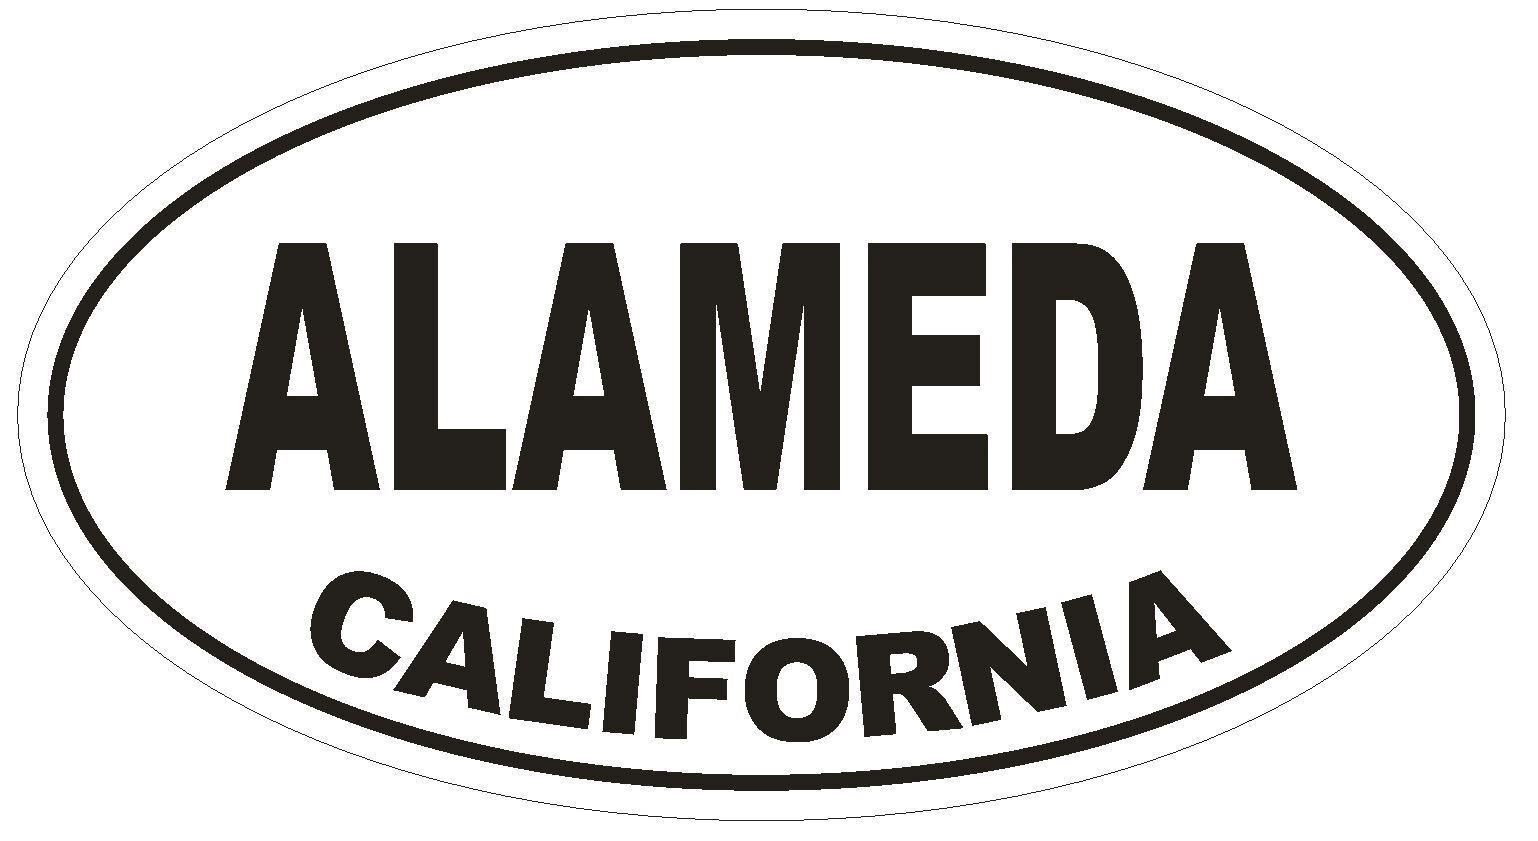 Alameda California Oval Bumper Sticker or Helmet Sticker D2845 Euro Oval